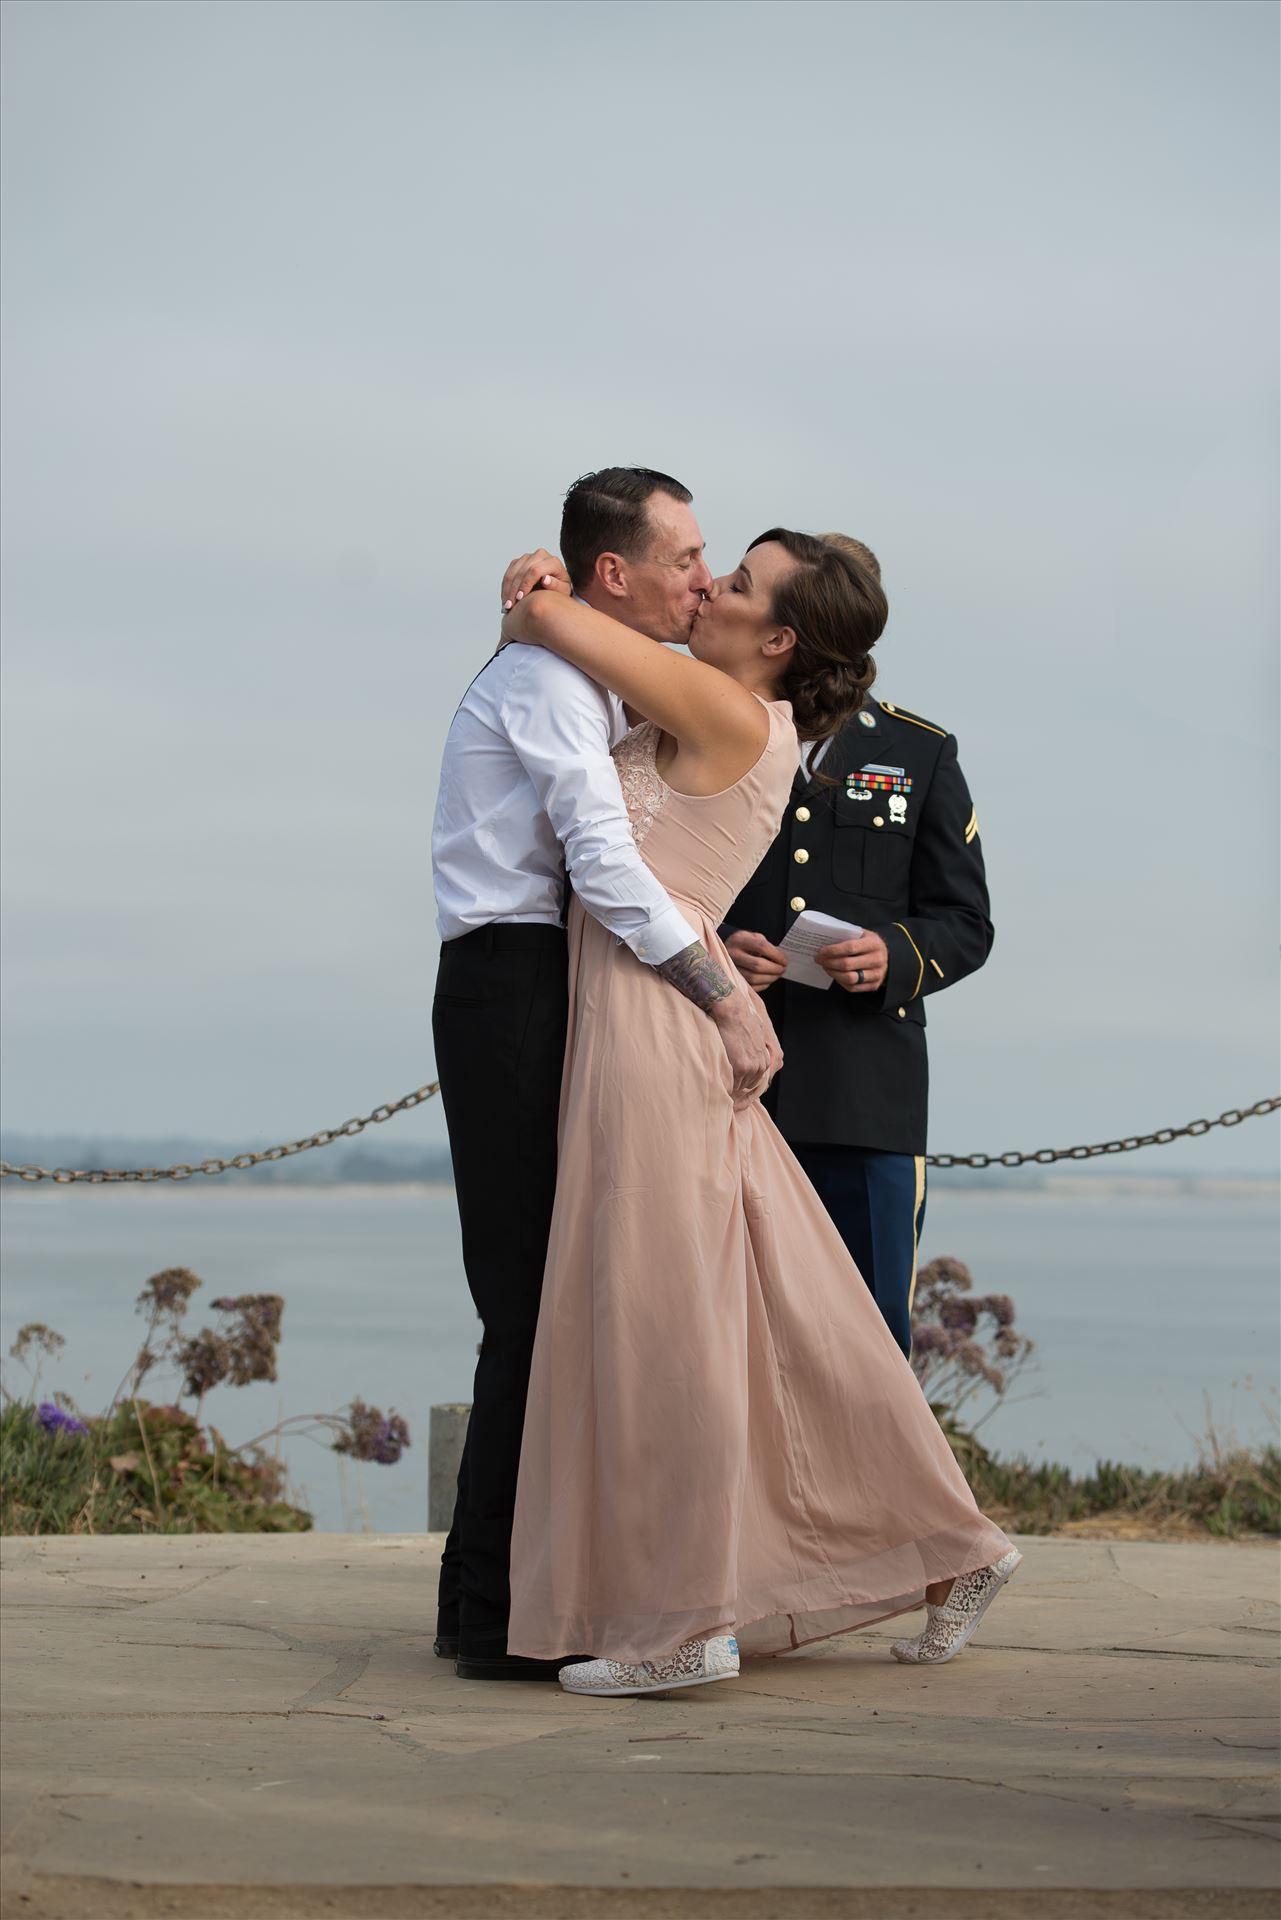 Courtney and Ruiz Shell Beach Wedding 07  by Sarah Williams